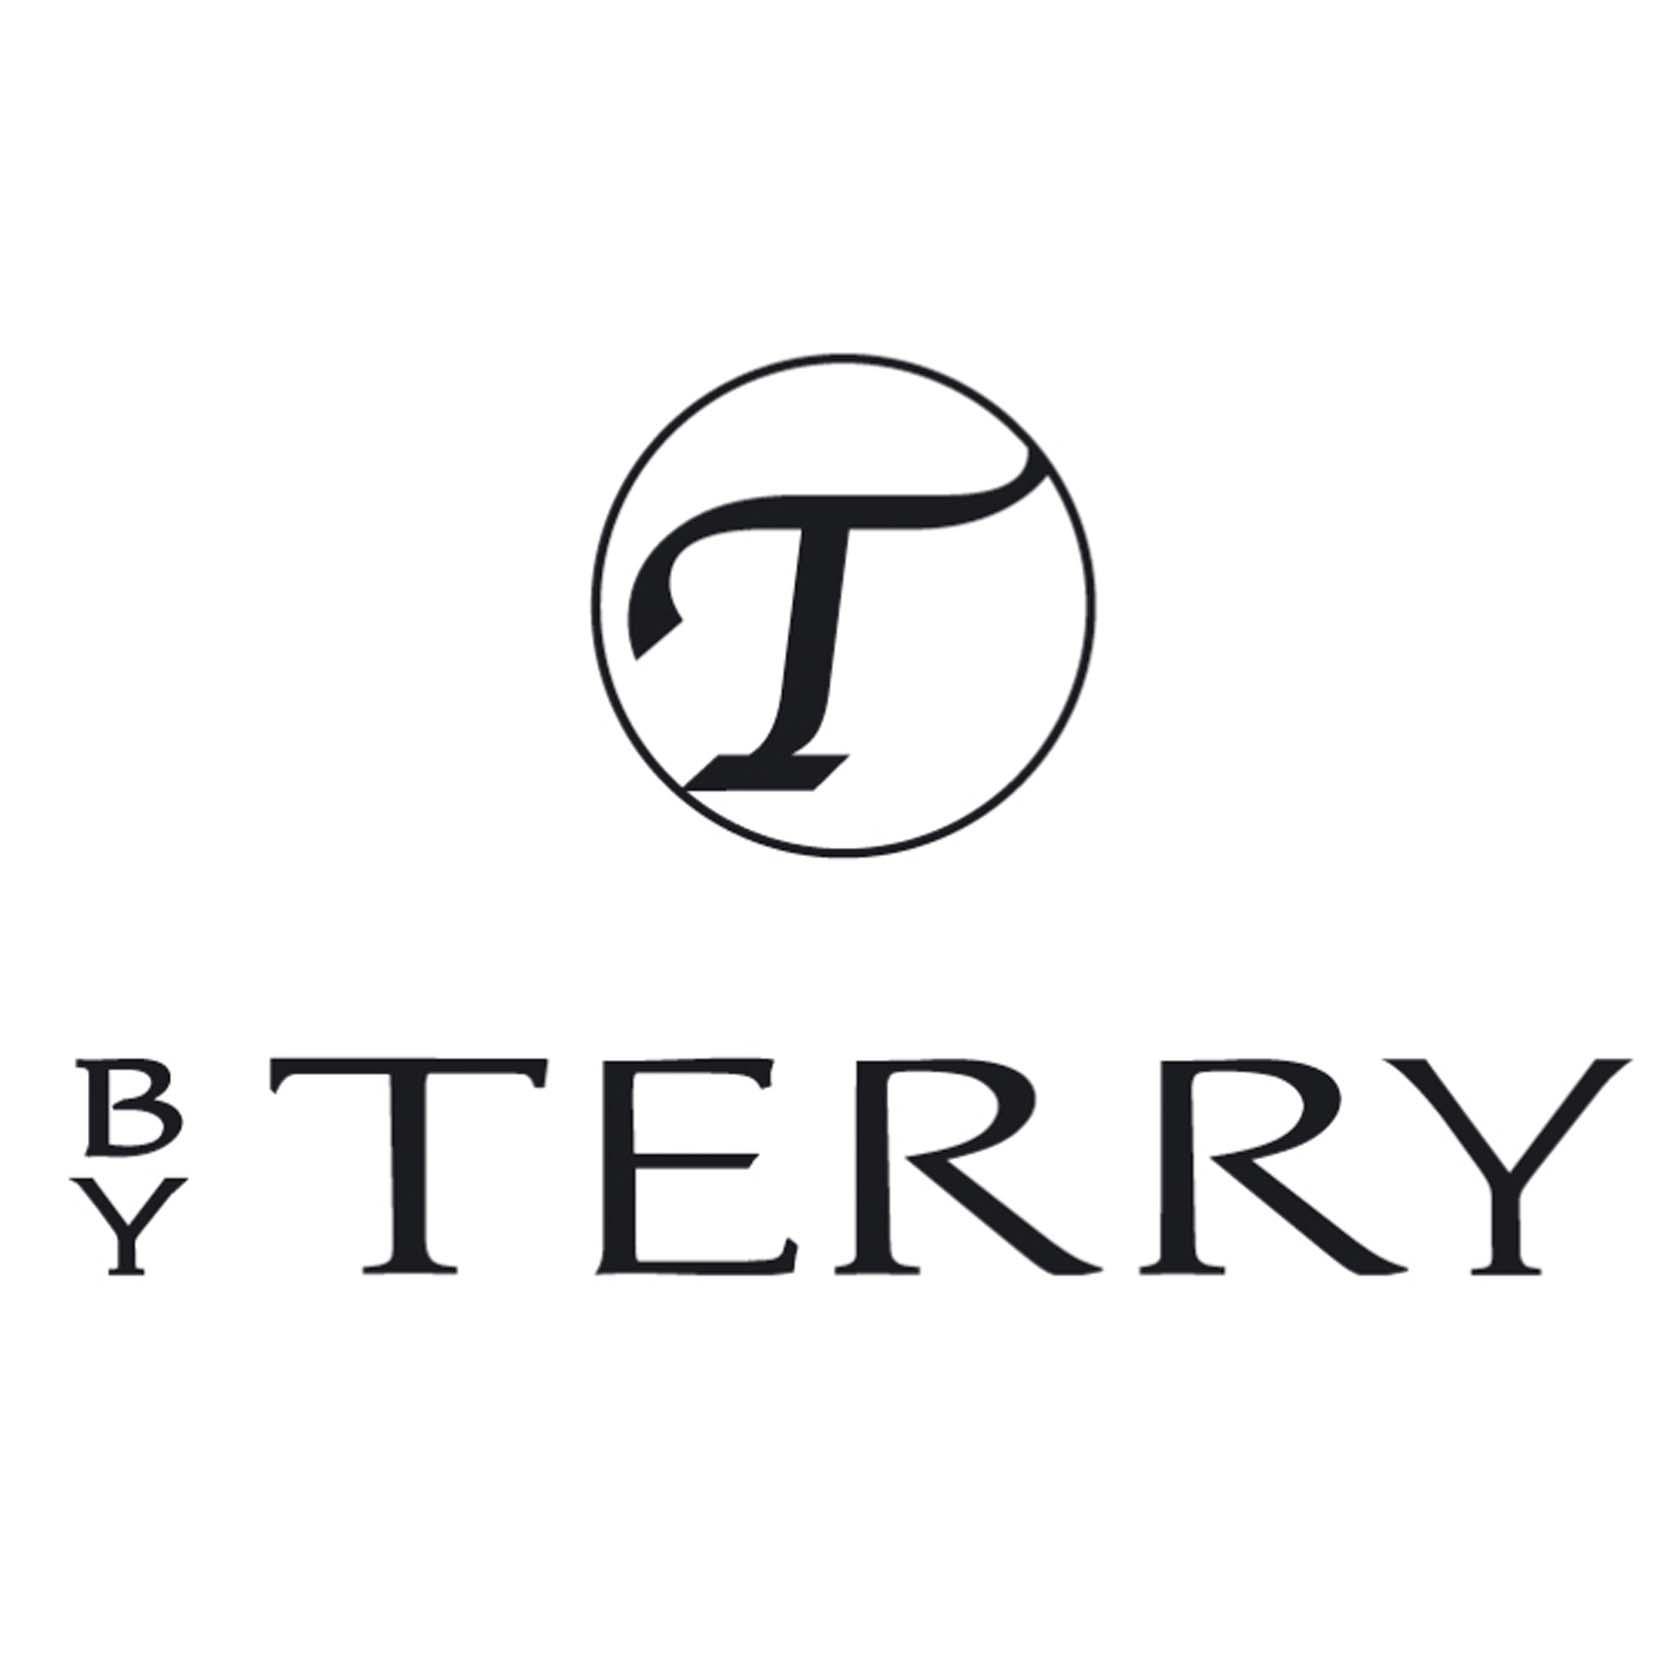 logo by terry.jpg